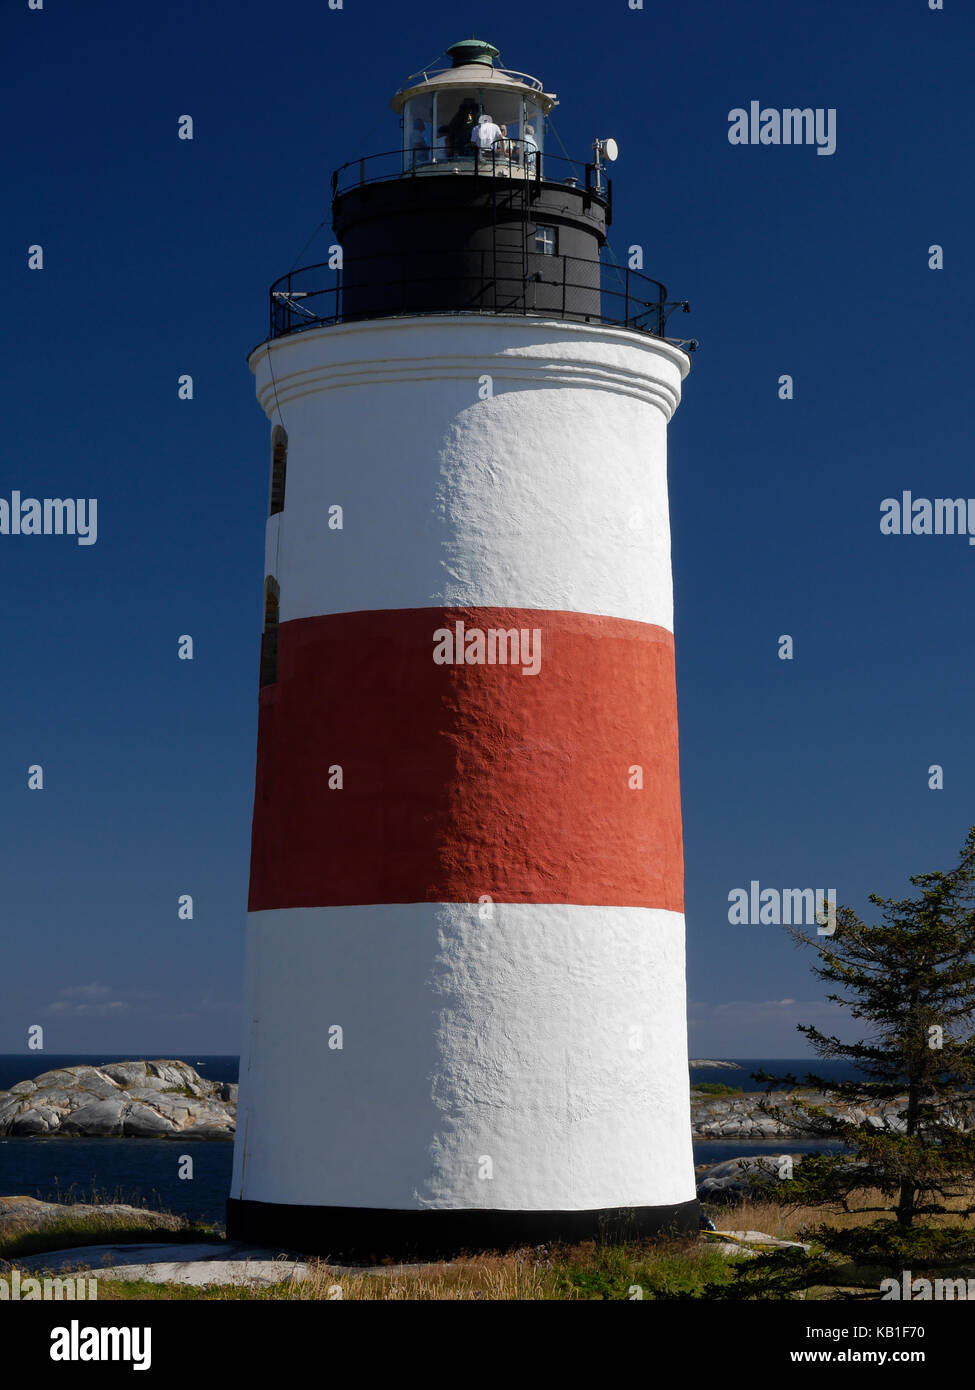 The lighthouse of Söderarm, outside of Räfsnäs, Gräddö, Rådmansö in the Roslagen archipelago of Stockholm, Sweden, Europe. Stock Photo